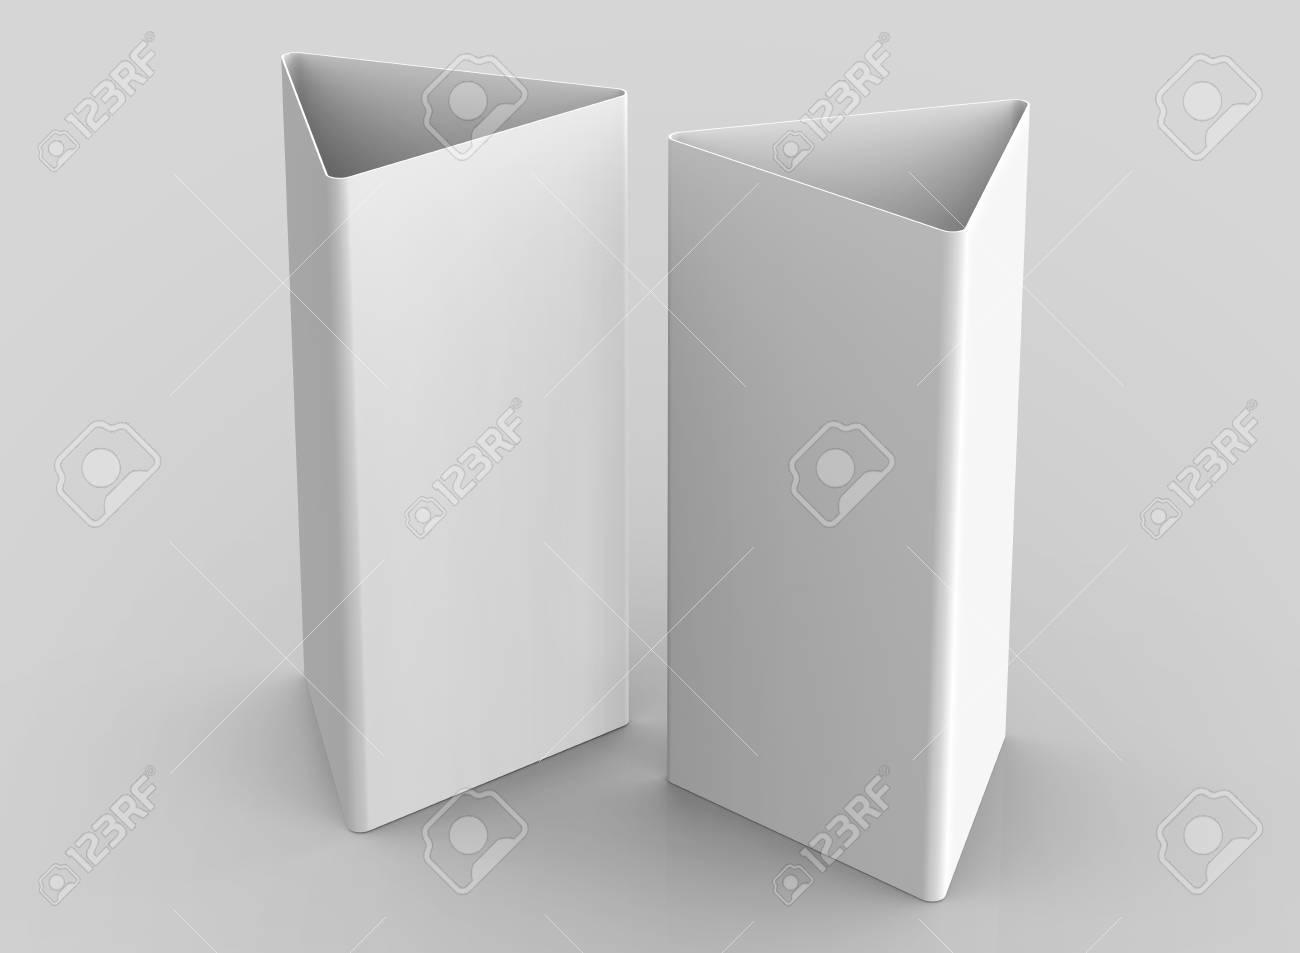 Blank Table Tent 3d Render Card Set Mockup For Design Uses Triangular Paper